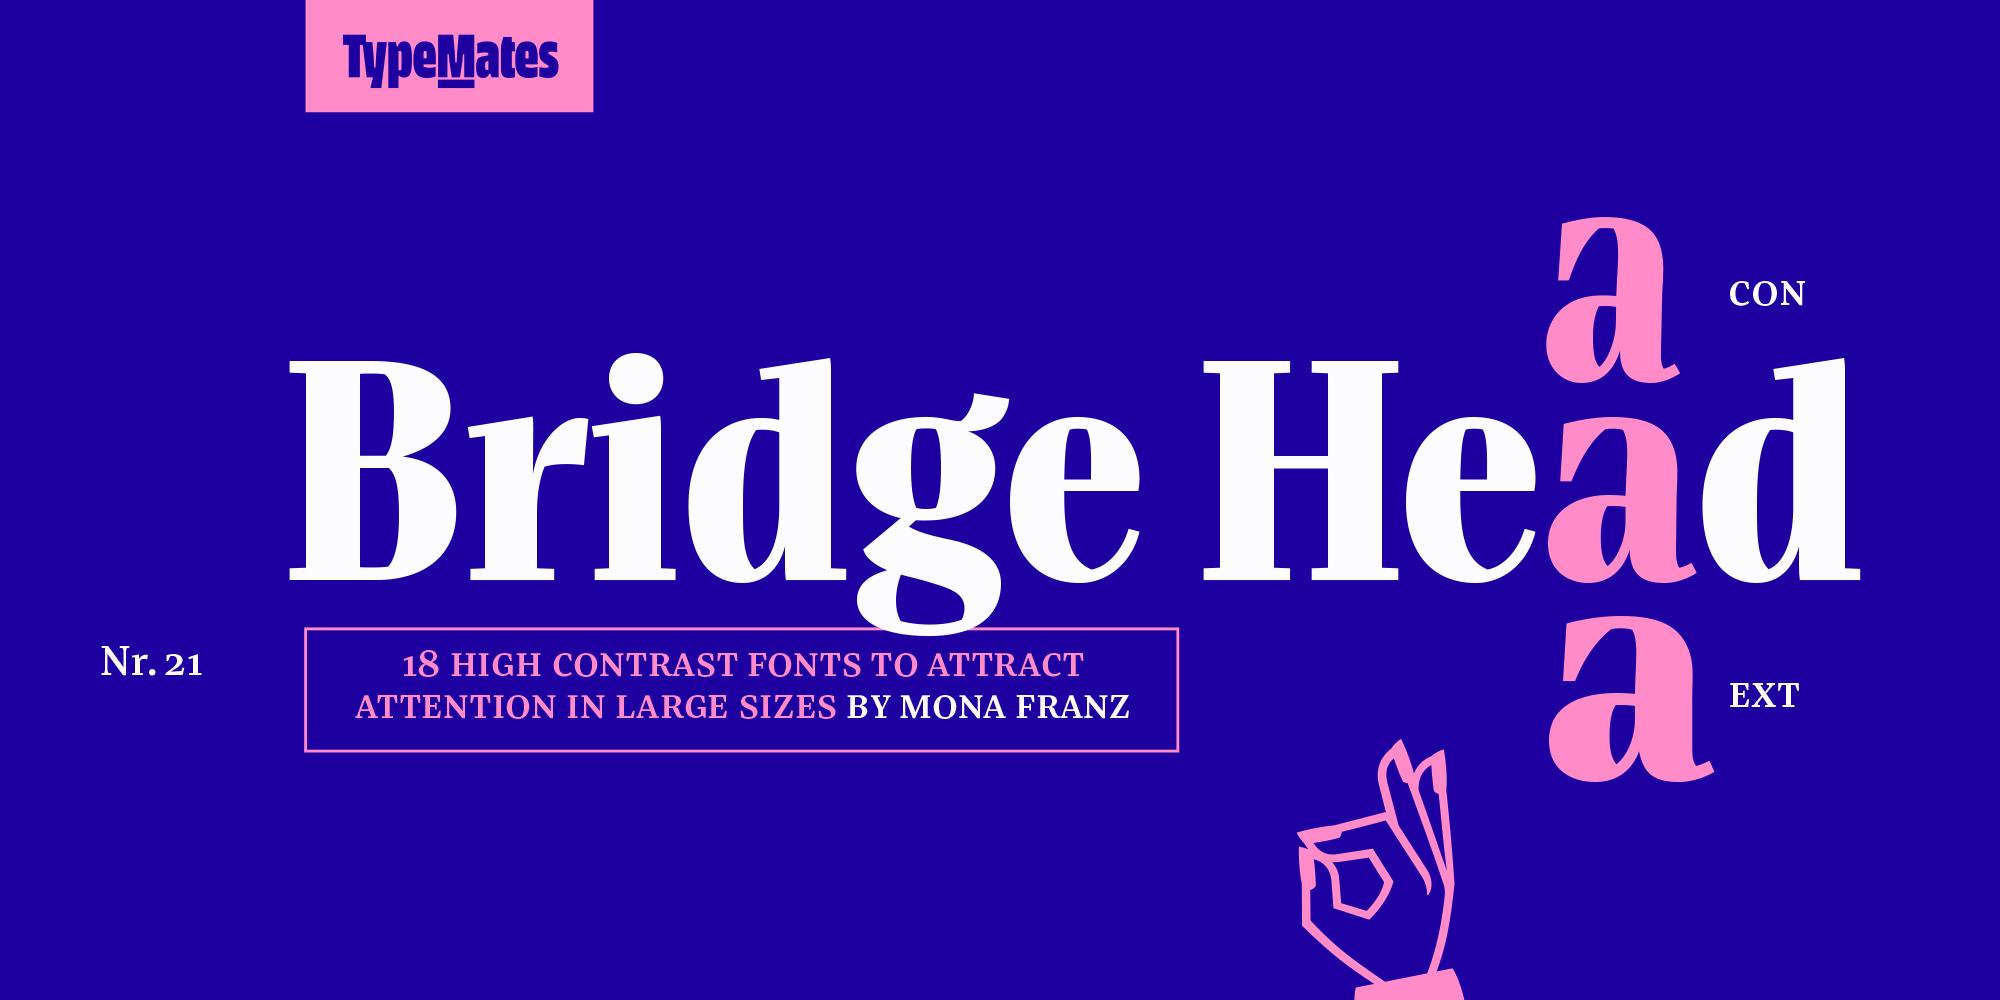 TypeMates-BridgeHead-MonaFranz-00